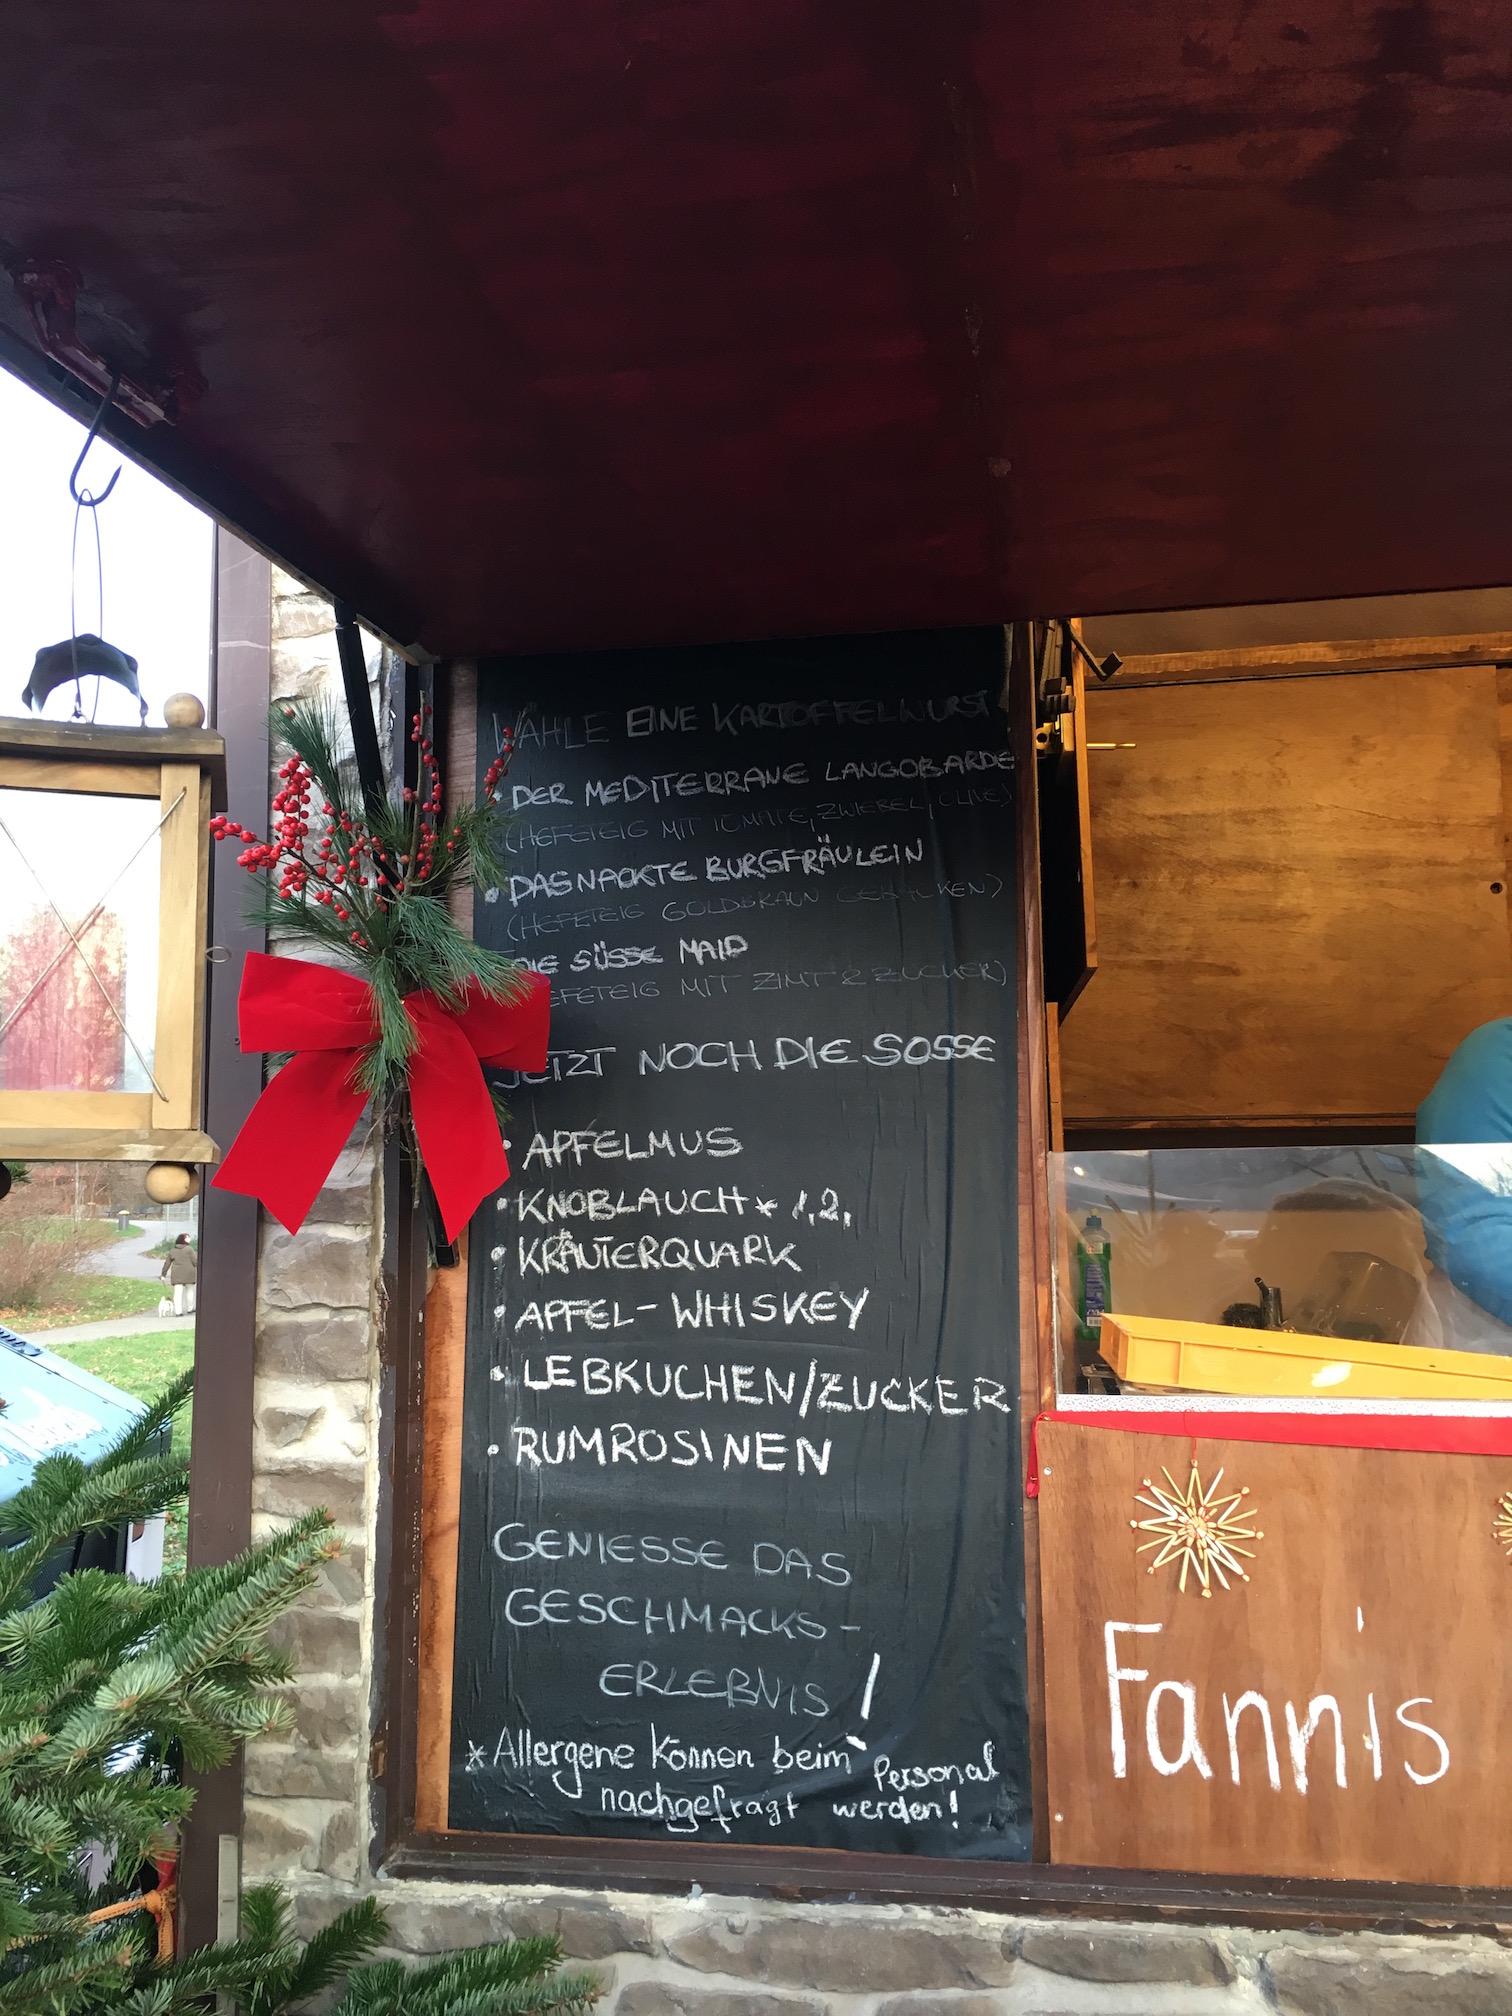 The menu at  Fanni's Kartoffelschmiede